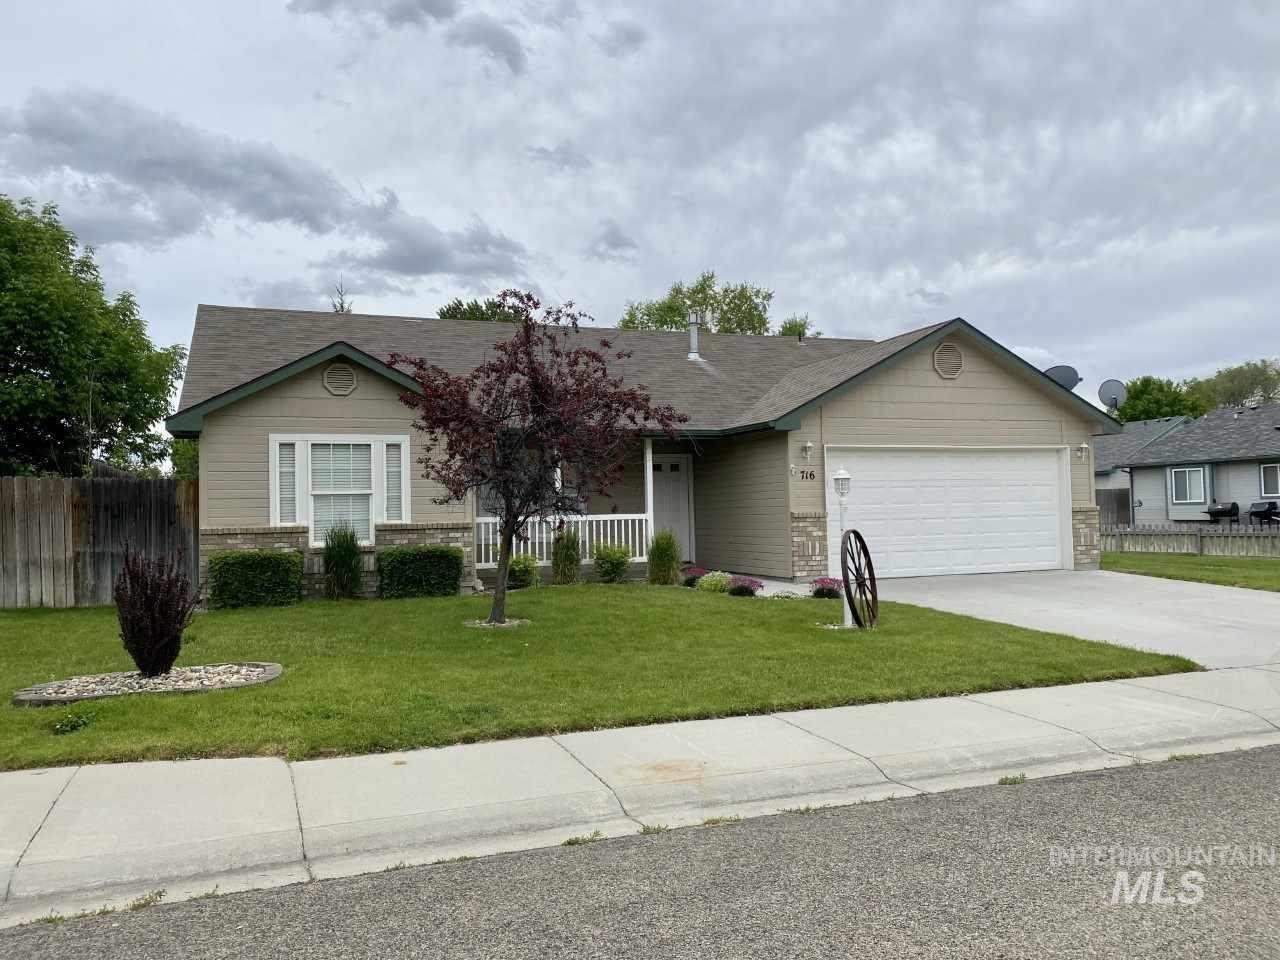 Photo of 716 N Celeste Ave, Star, ID 83669 (MLS # 98766601)